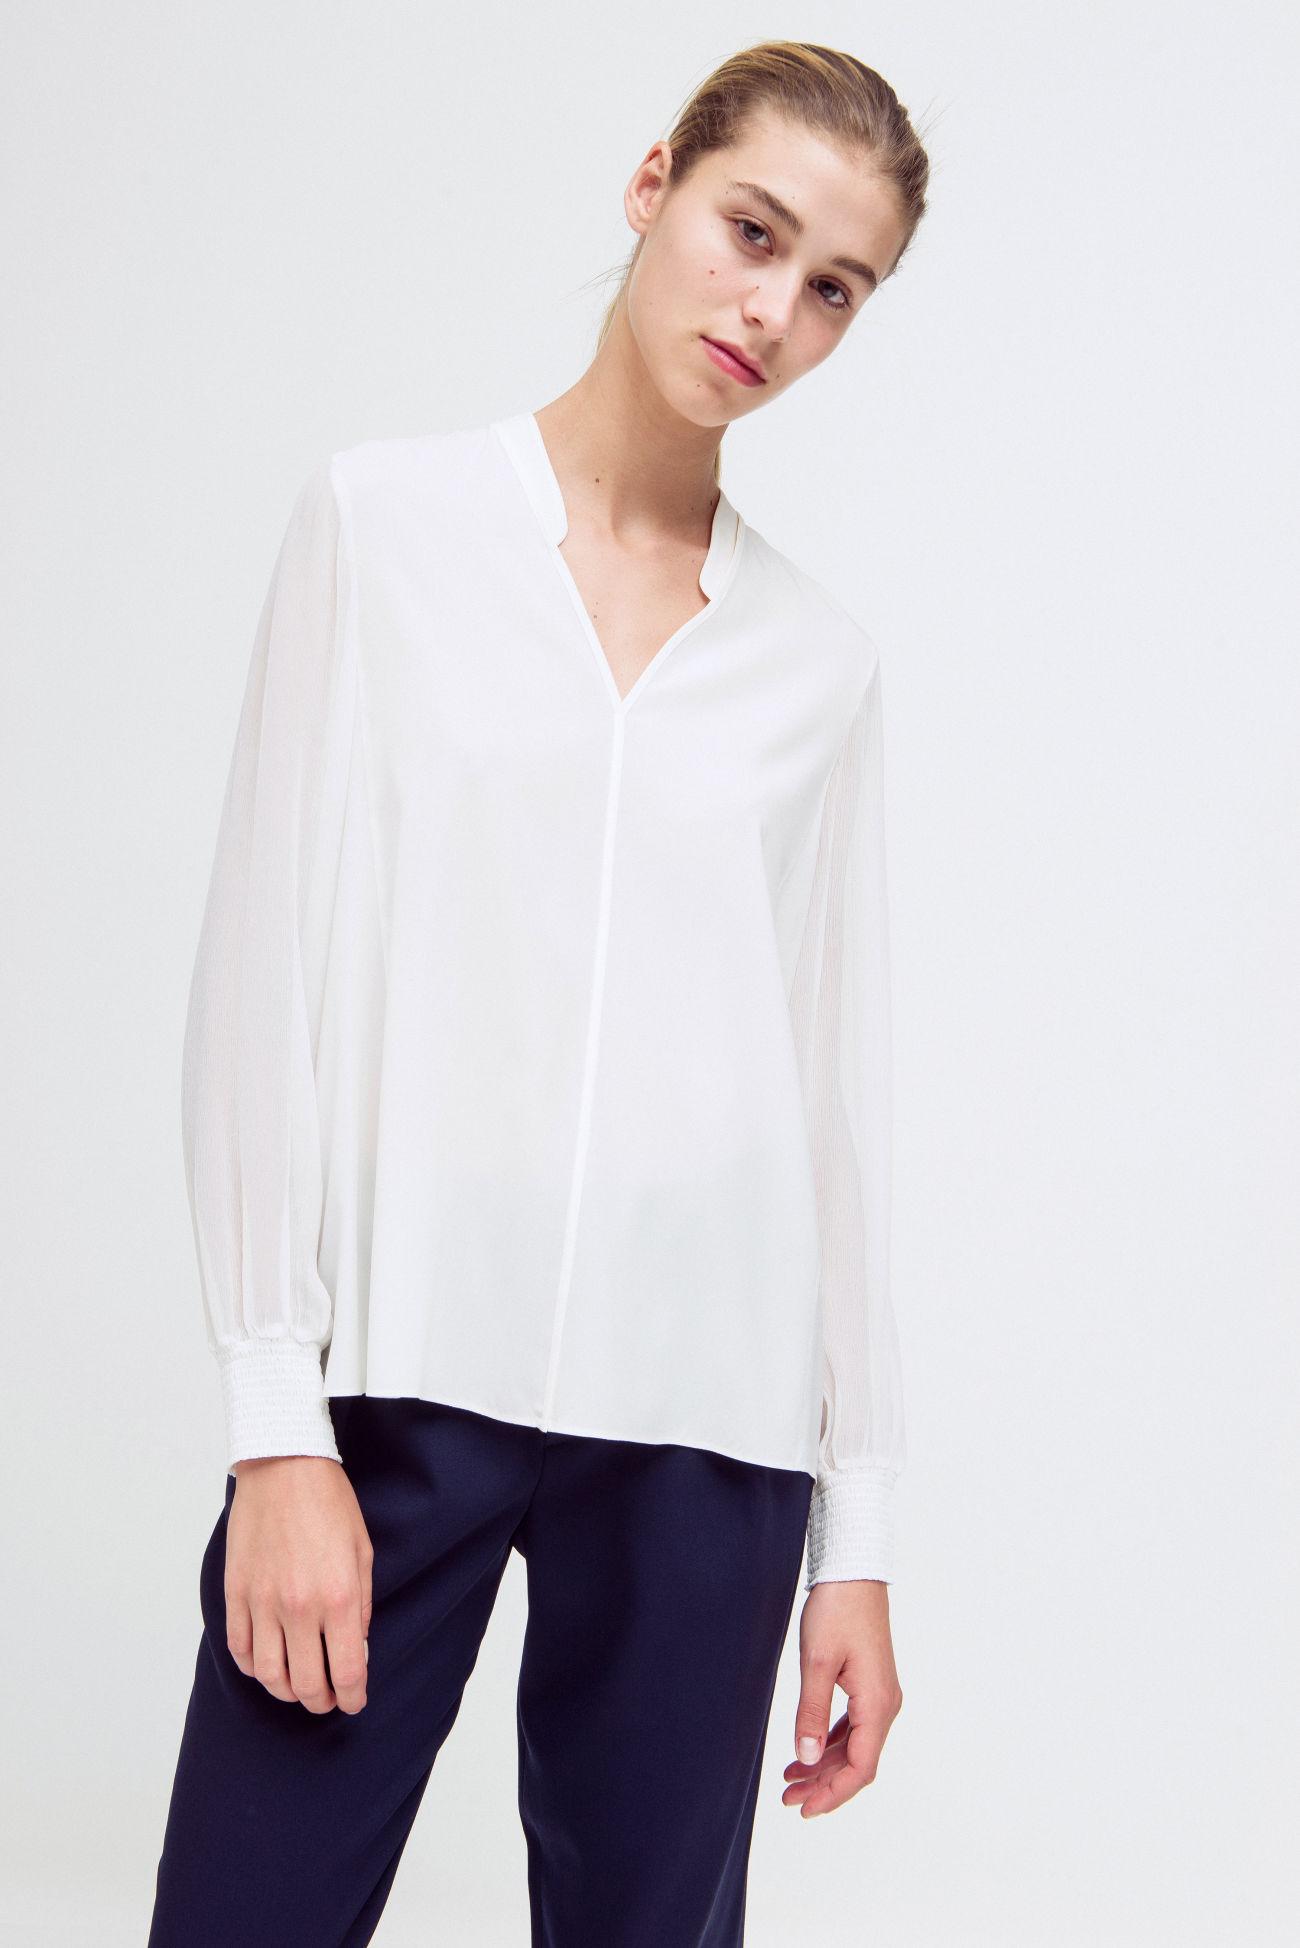 Loose summer blouse